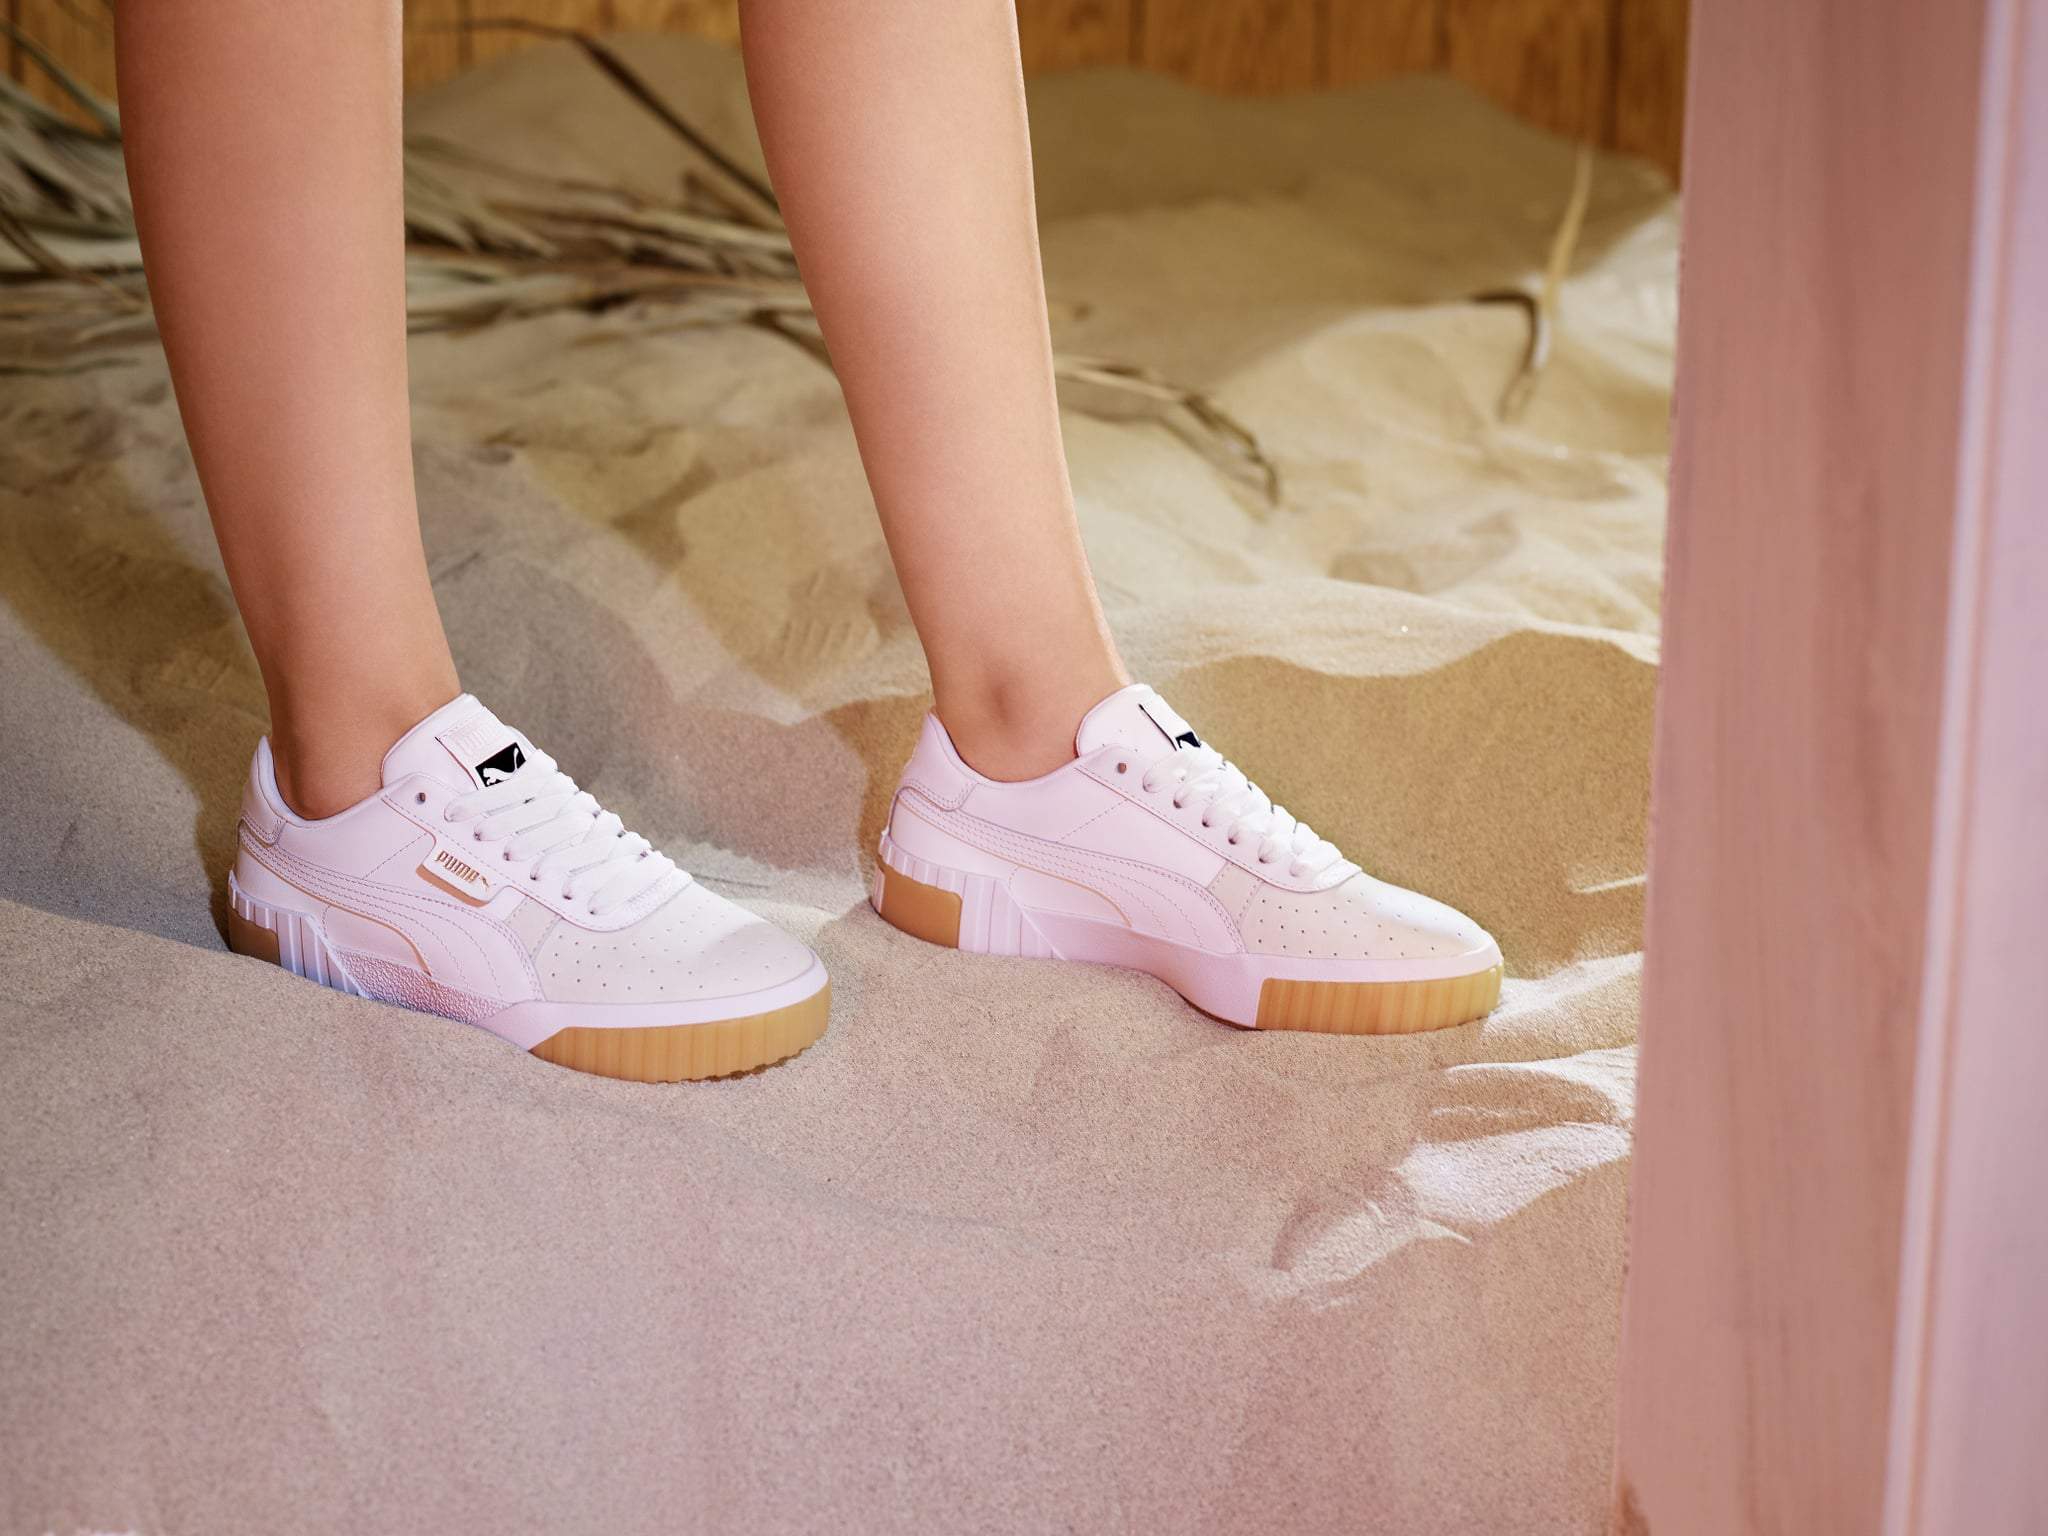 Selena Gomez Puma Cali Exotic Sneakers Campaign 2019 ...